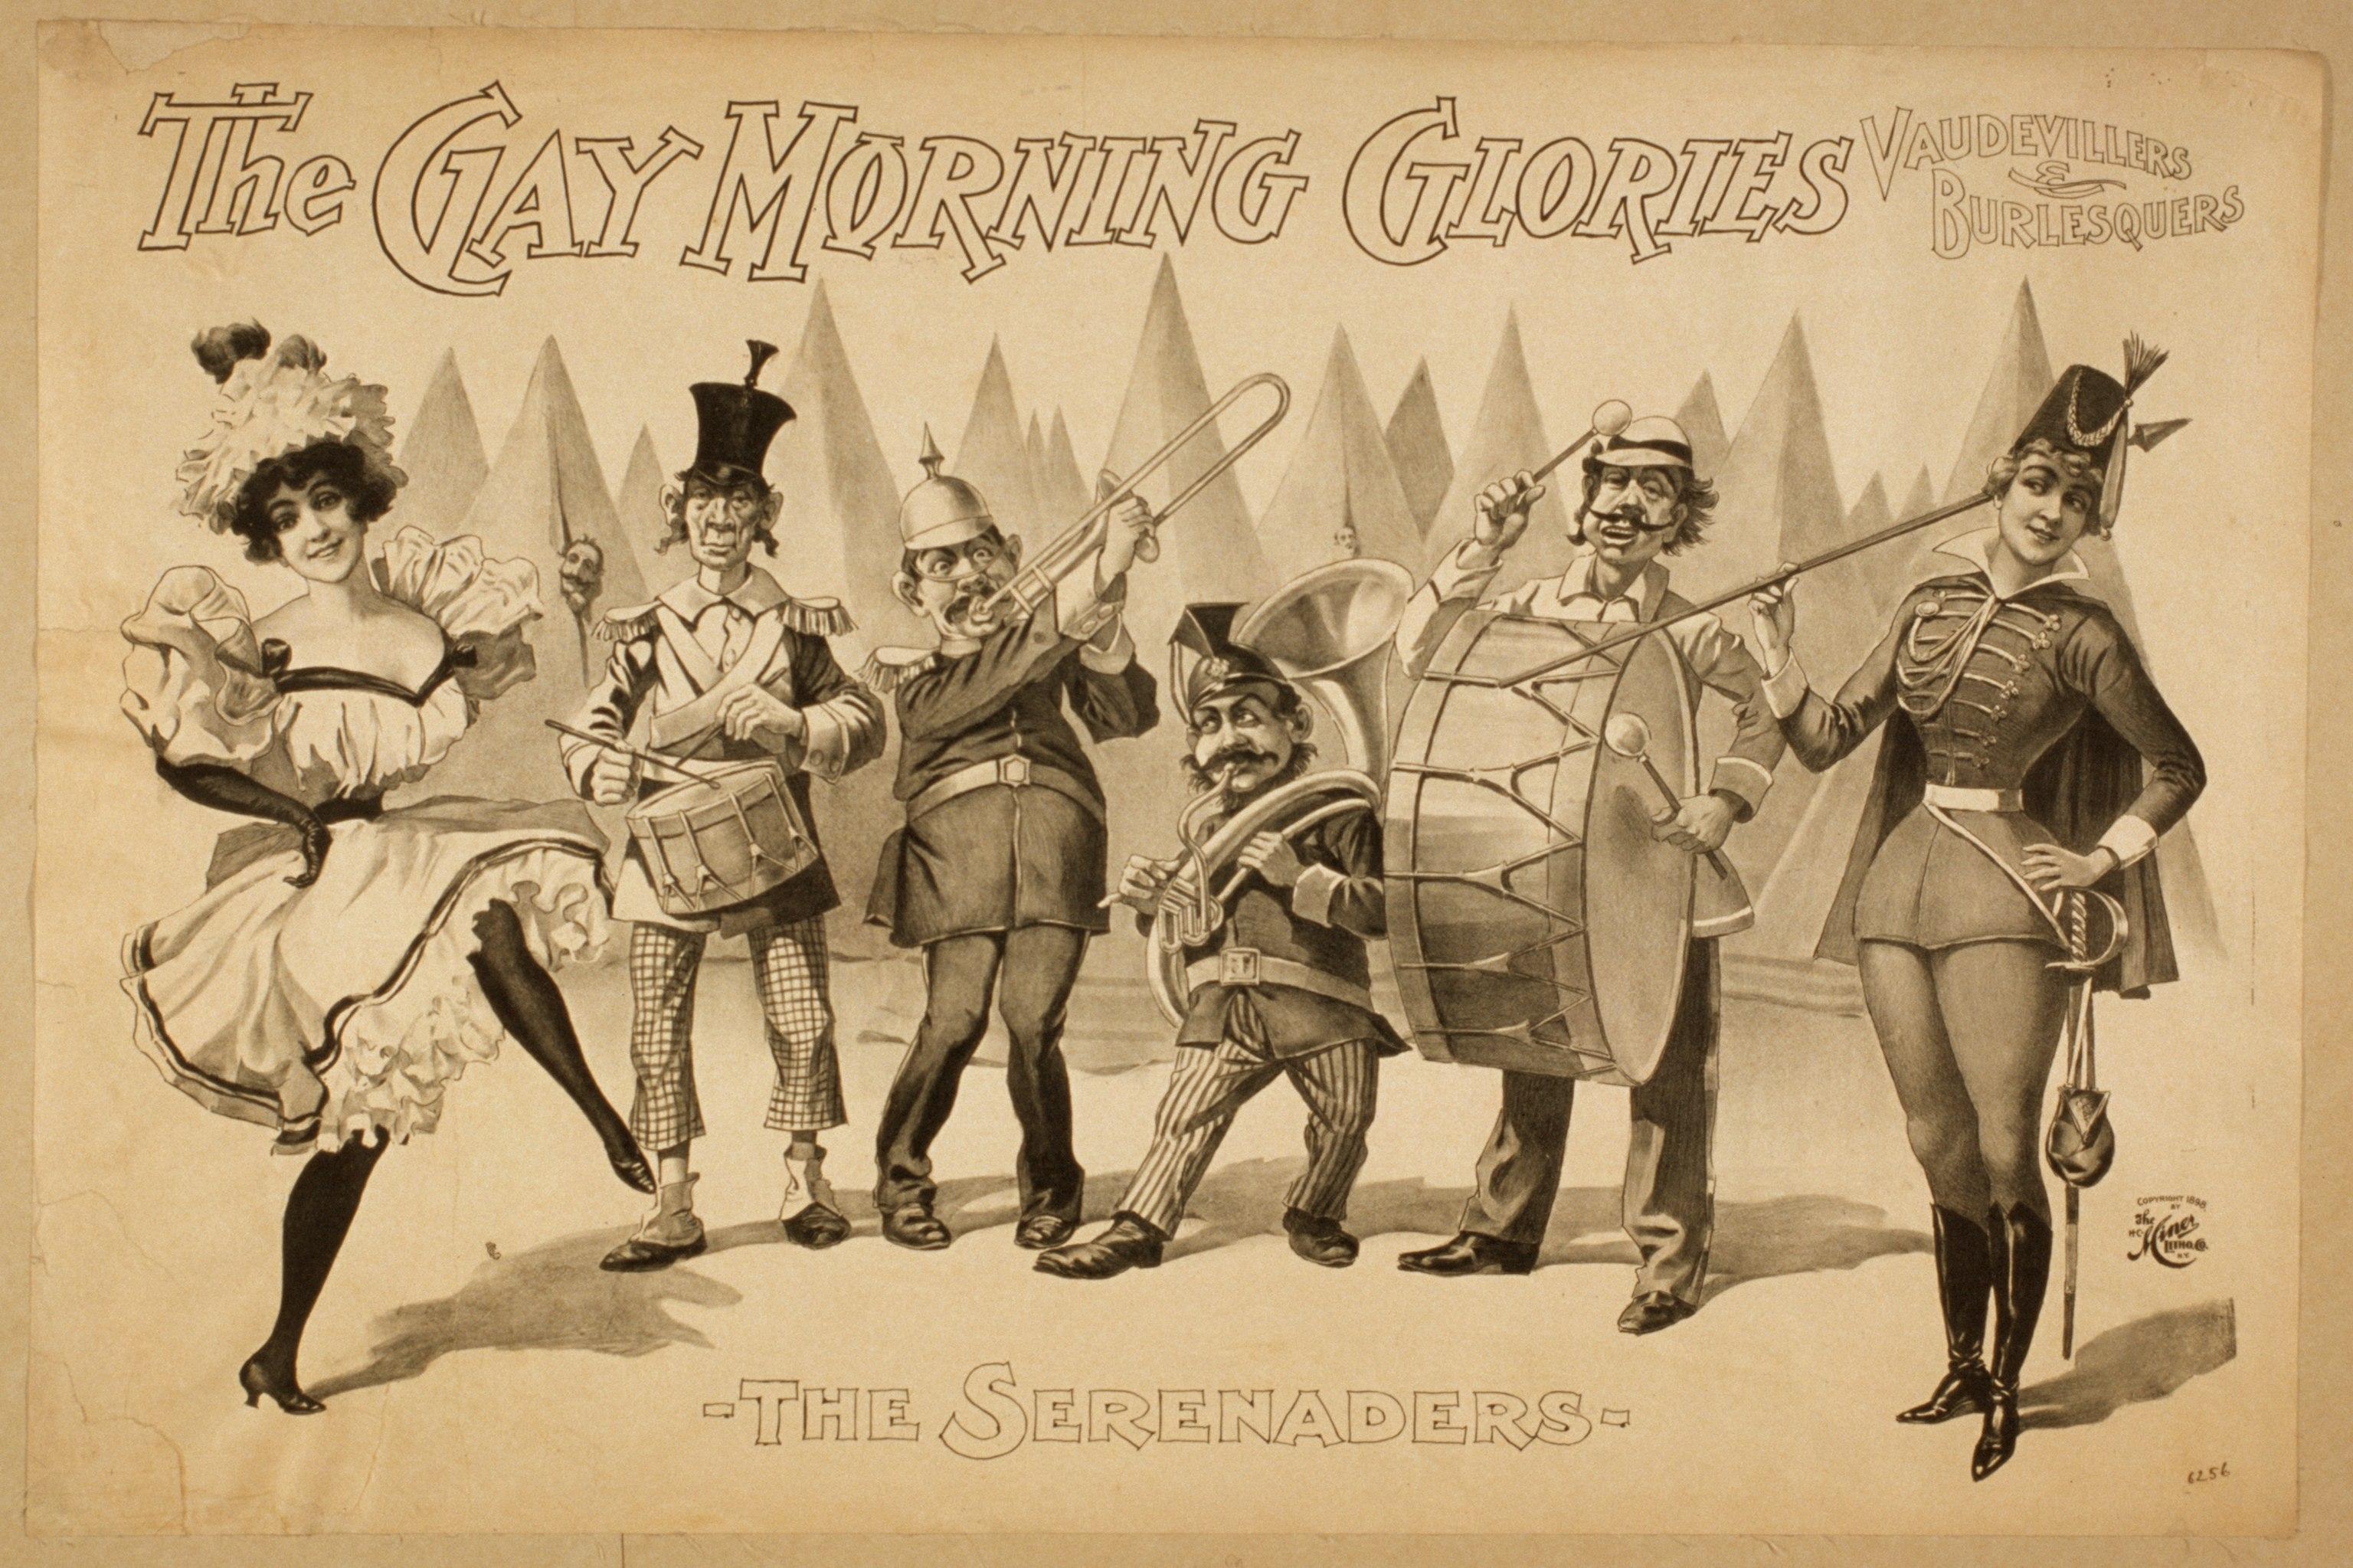 gov/service/pnp/var/0300/0345/0345r.jpg Original url: https://www.loc.gov/pictures/item/2014635691/ Author H.C. Miner Litho. Co.; Gay Morning Glories